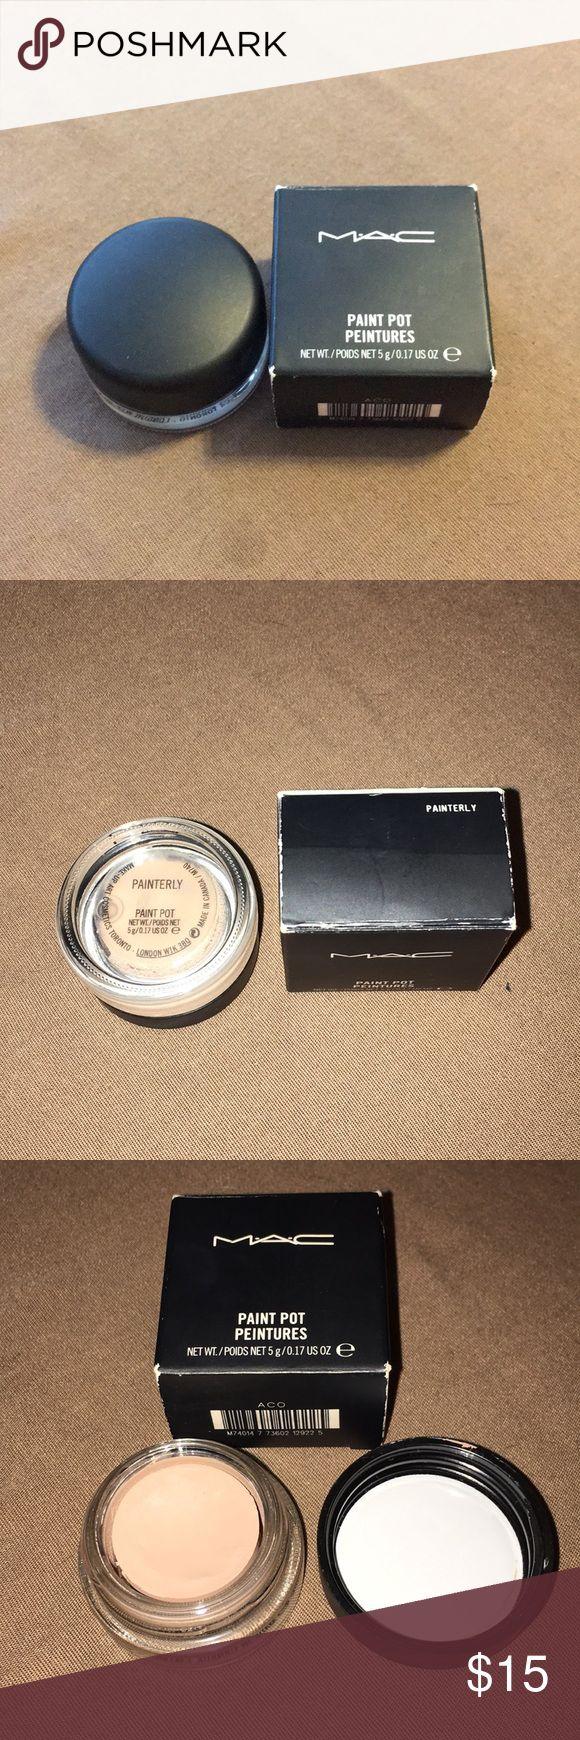 Mac Pro Longwear Paint Pot PAINTERLY Painted pots, Mac